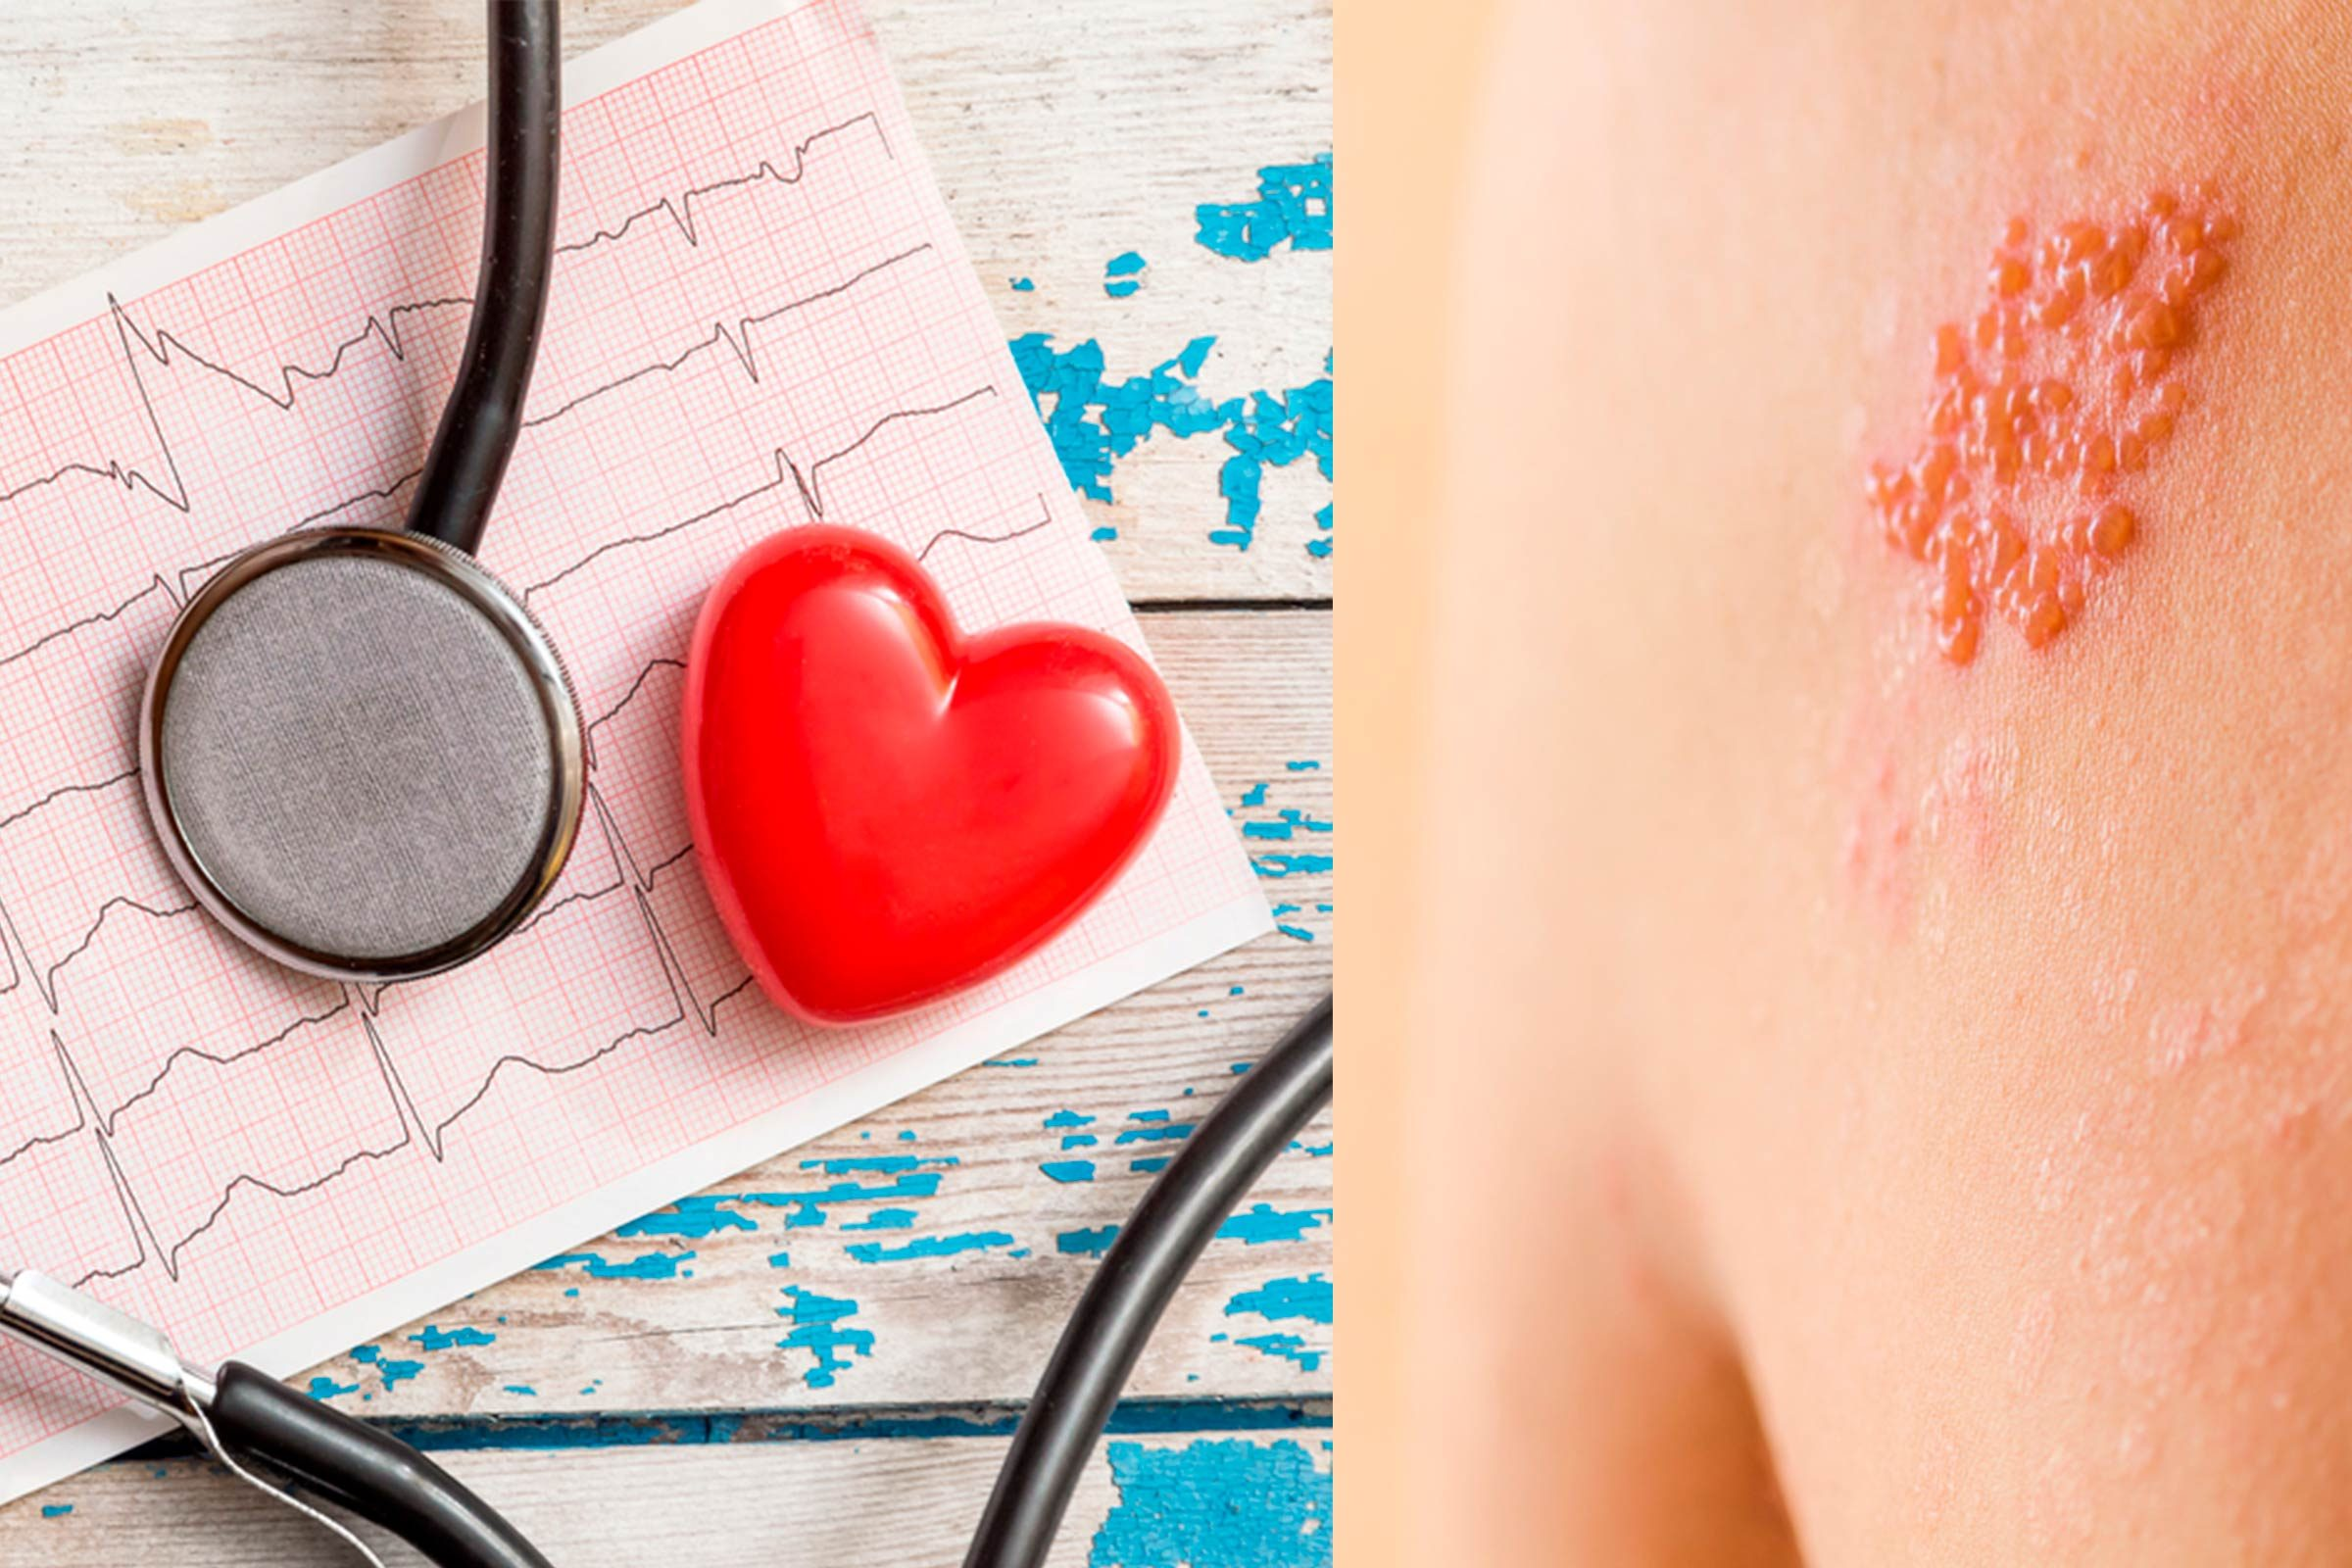 shingles rash, stethoscope and heart ekg